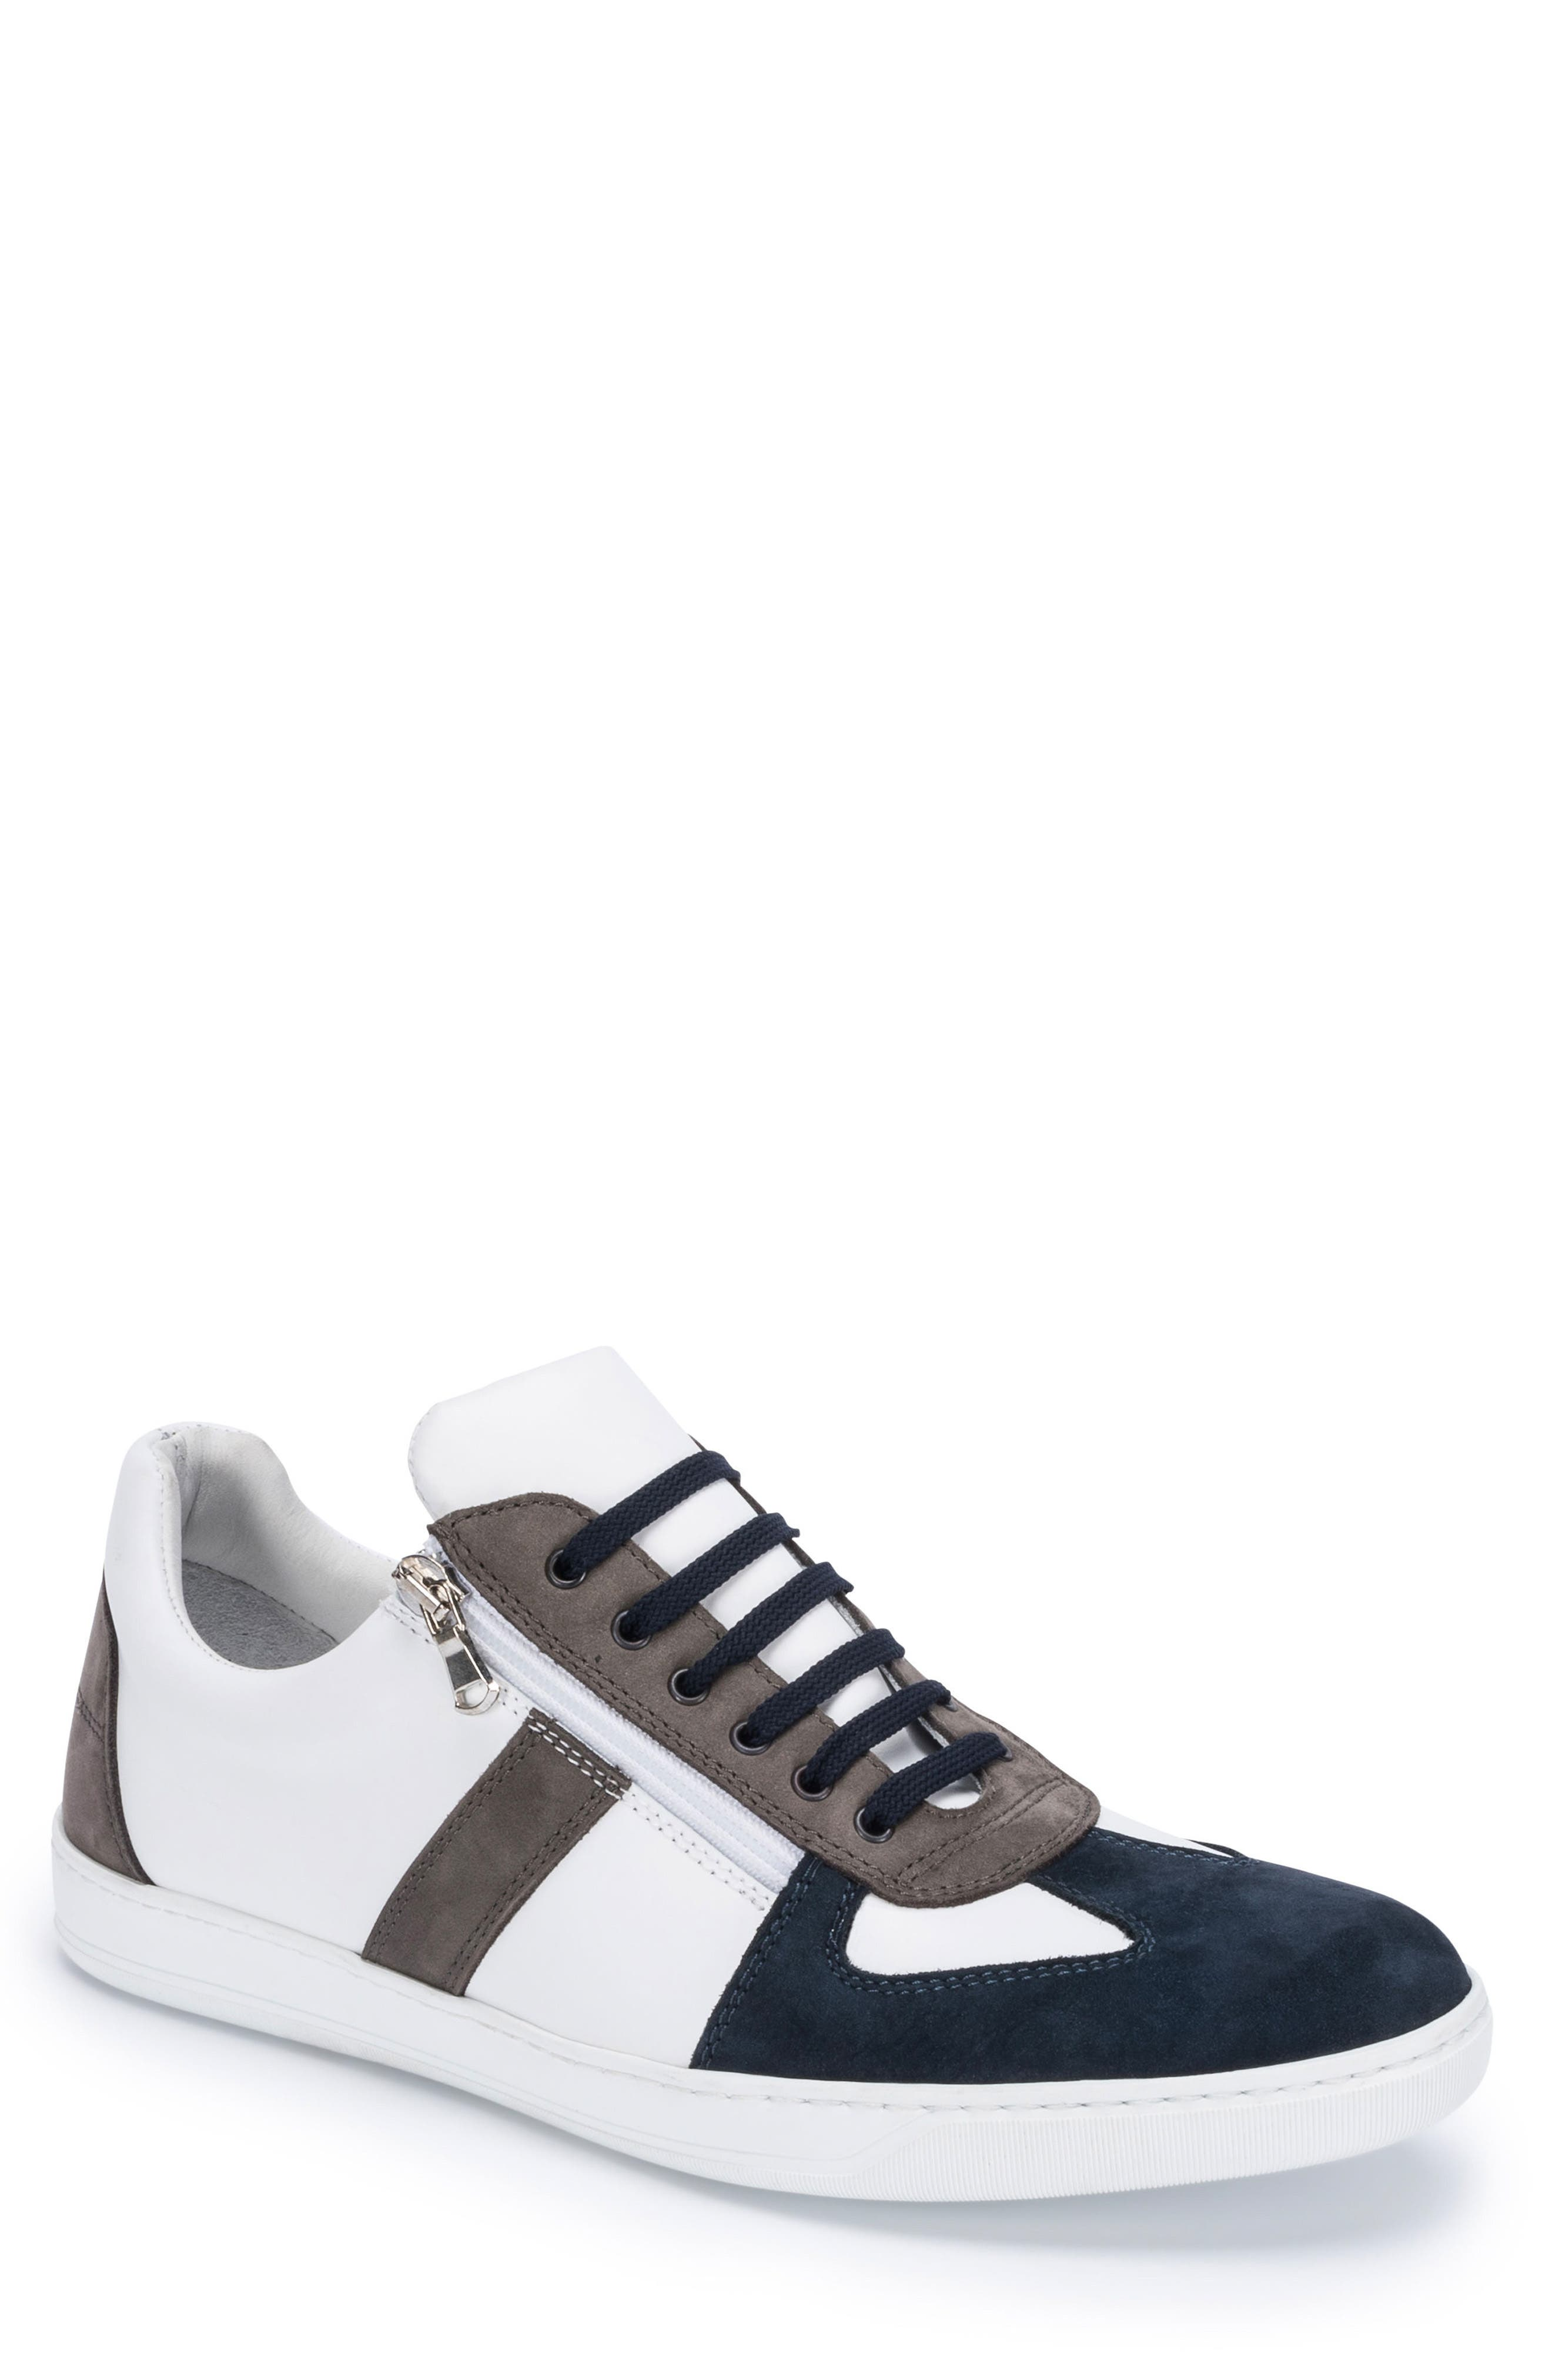 Calabria Sneaker,                             Main thumbnail 1, color,                             White